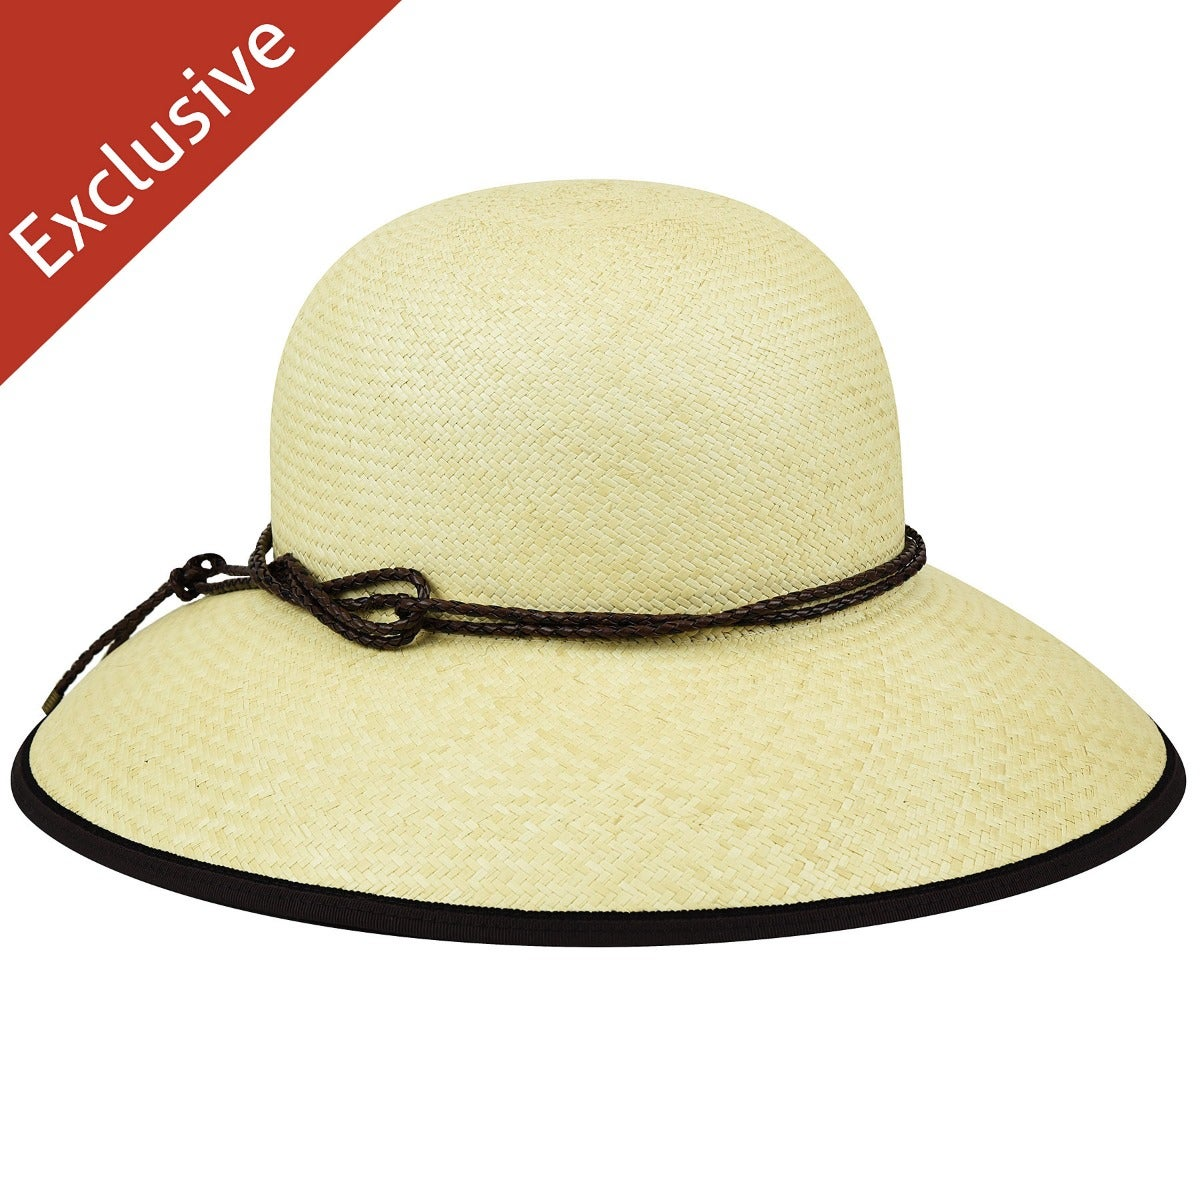 Lil W. Wide Brim Hat - Exclusive - Natural/L